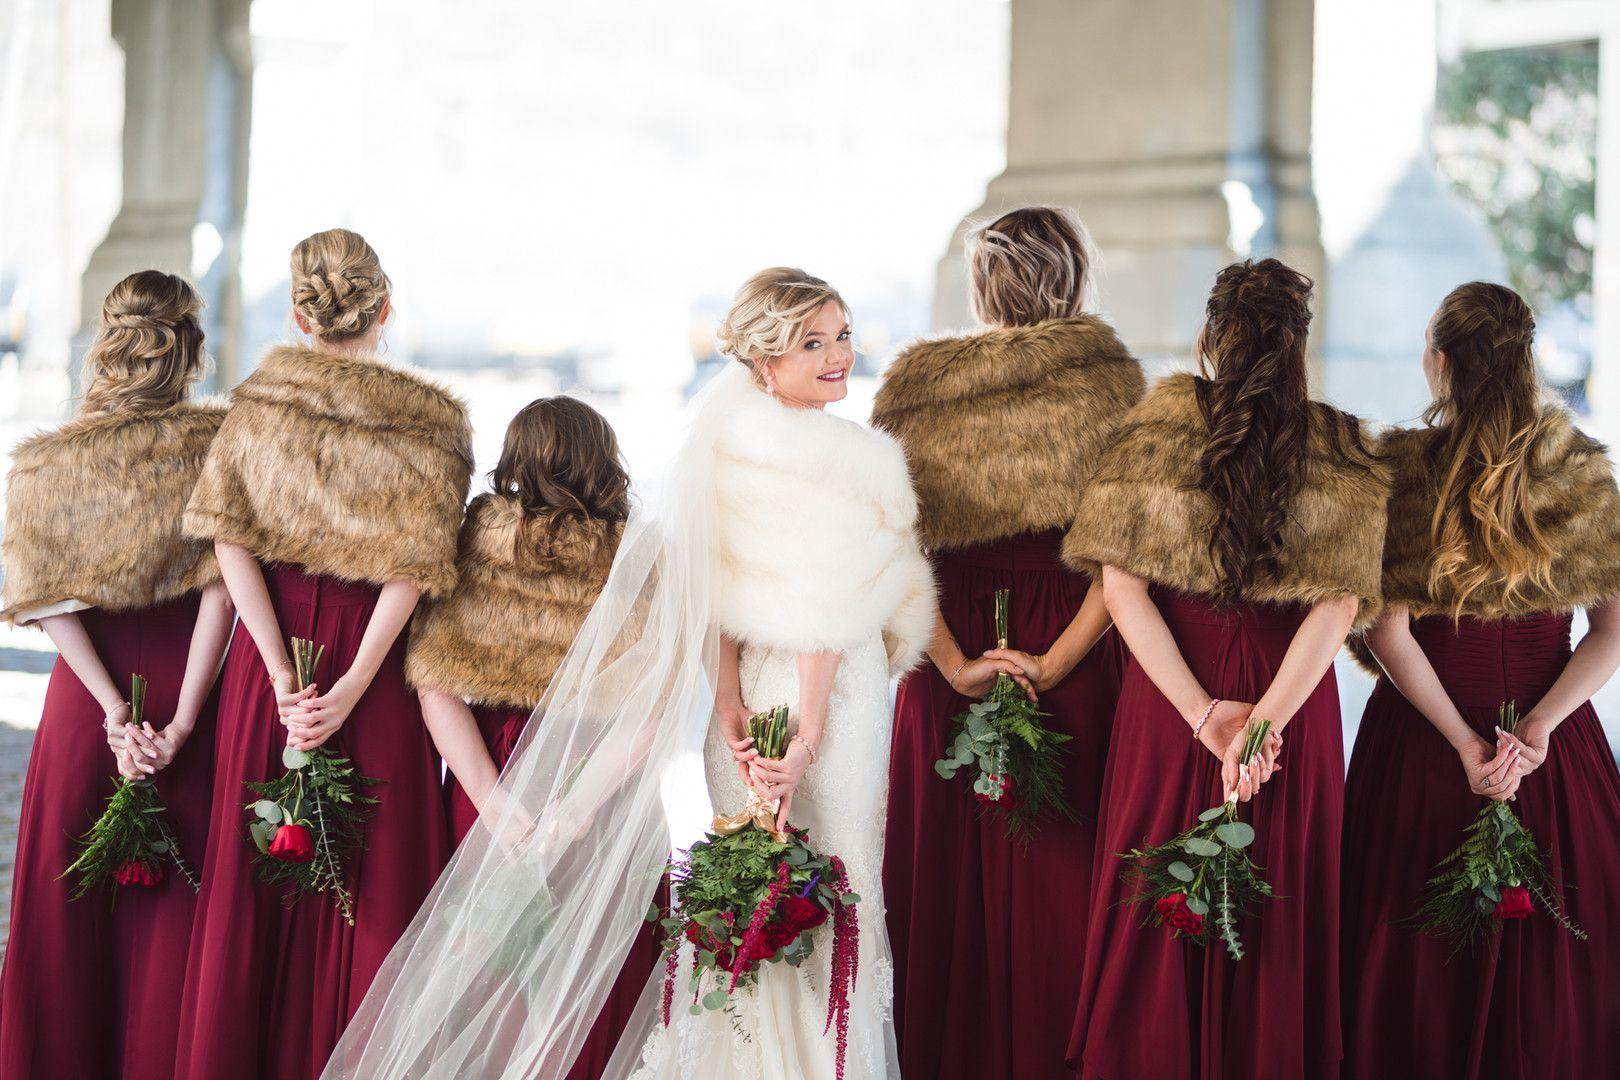 Rachel Isaac Wedding 28 Event Space Kansas City Mo Us Winter Bridesmaid Dresses Christmas Bridesmaid Dresses December Wedding Dresses